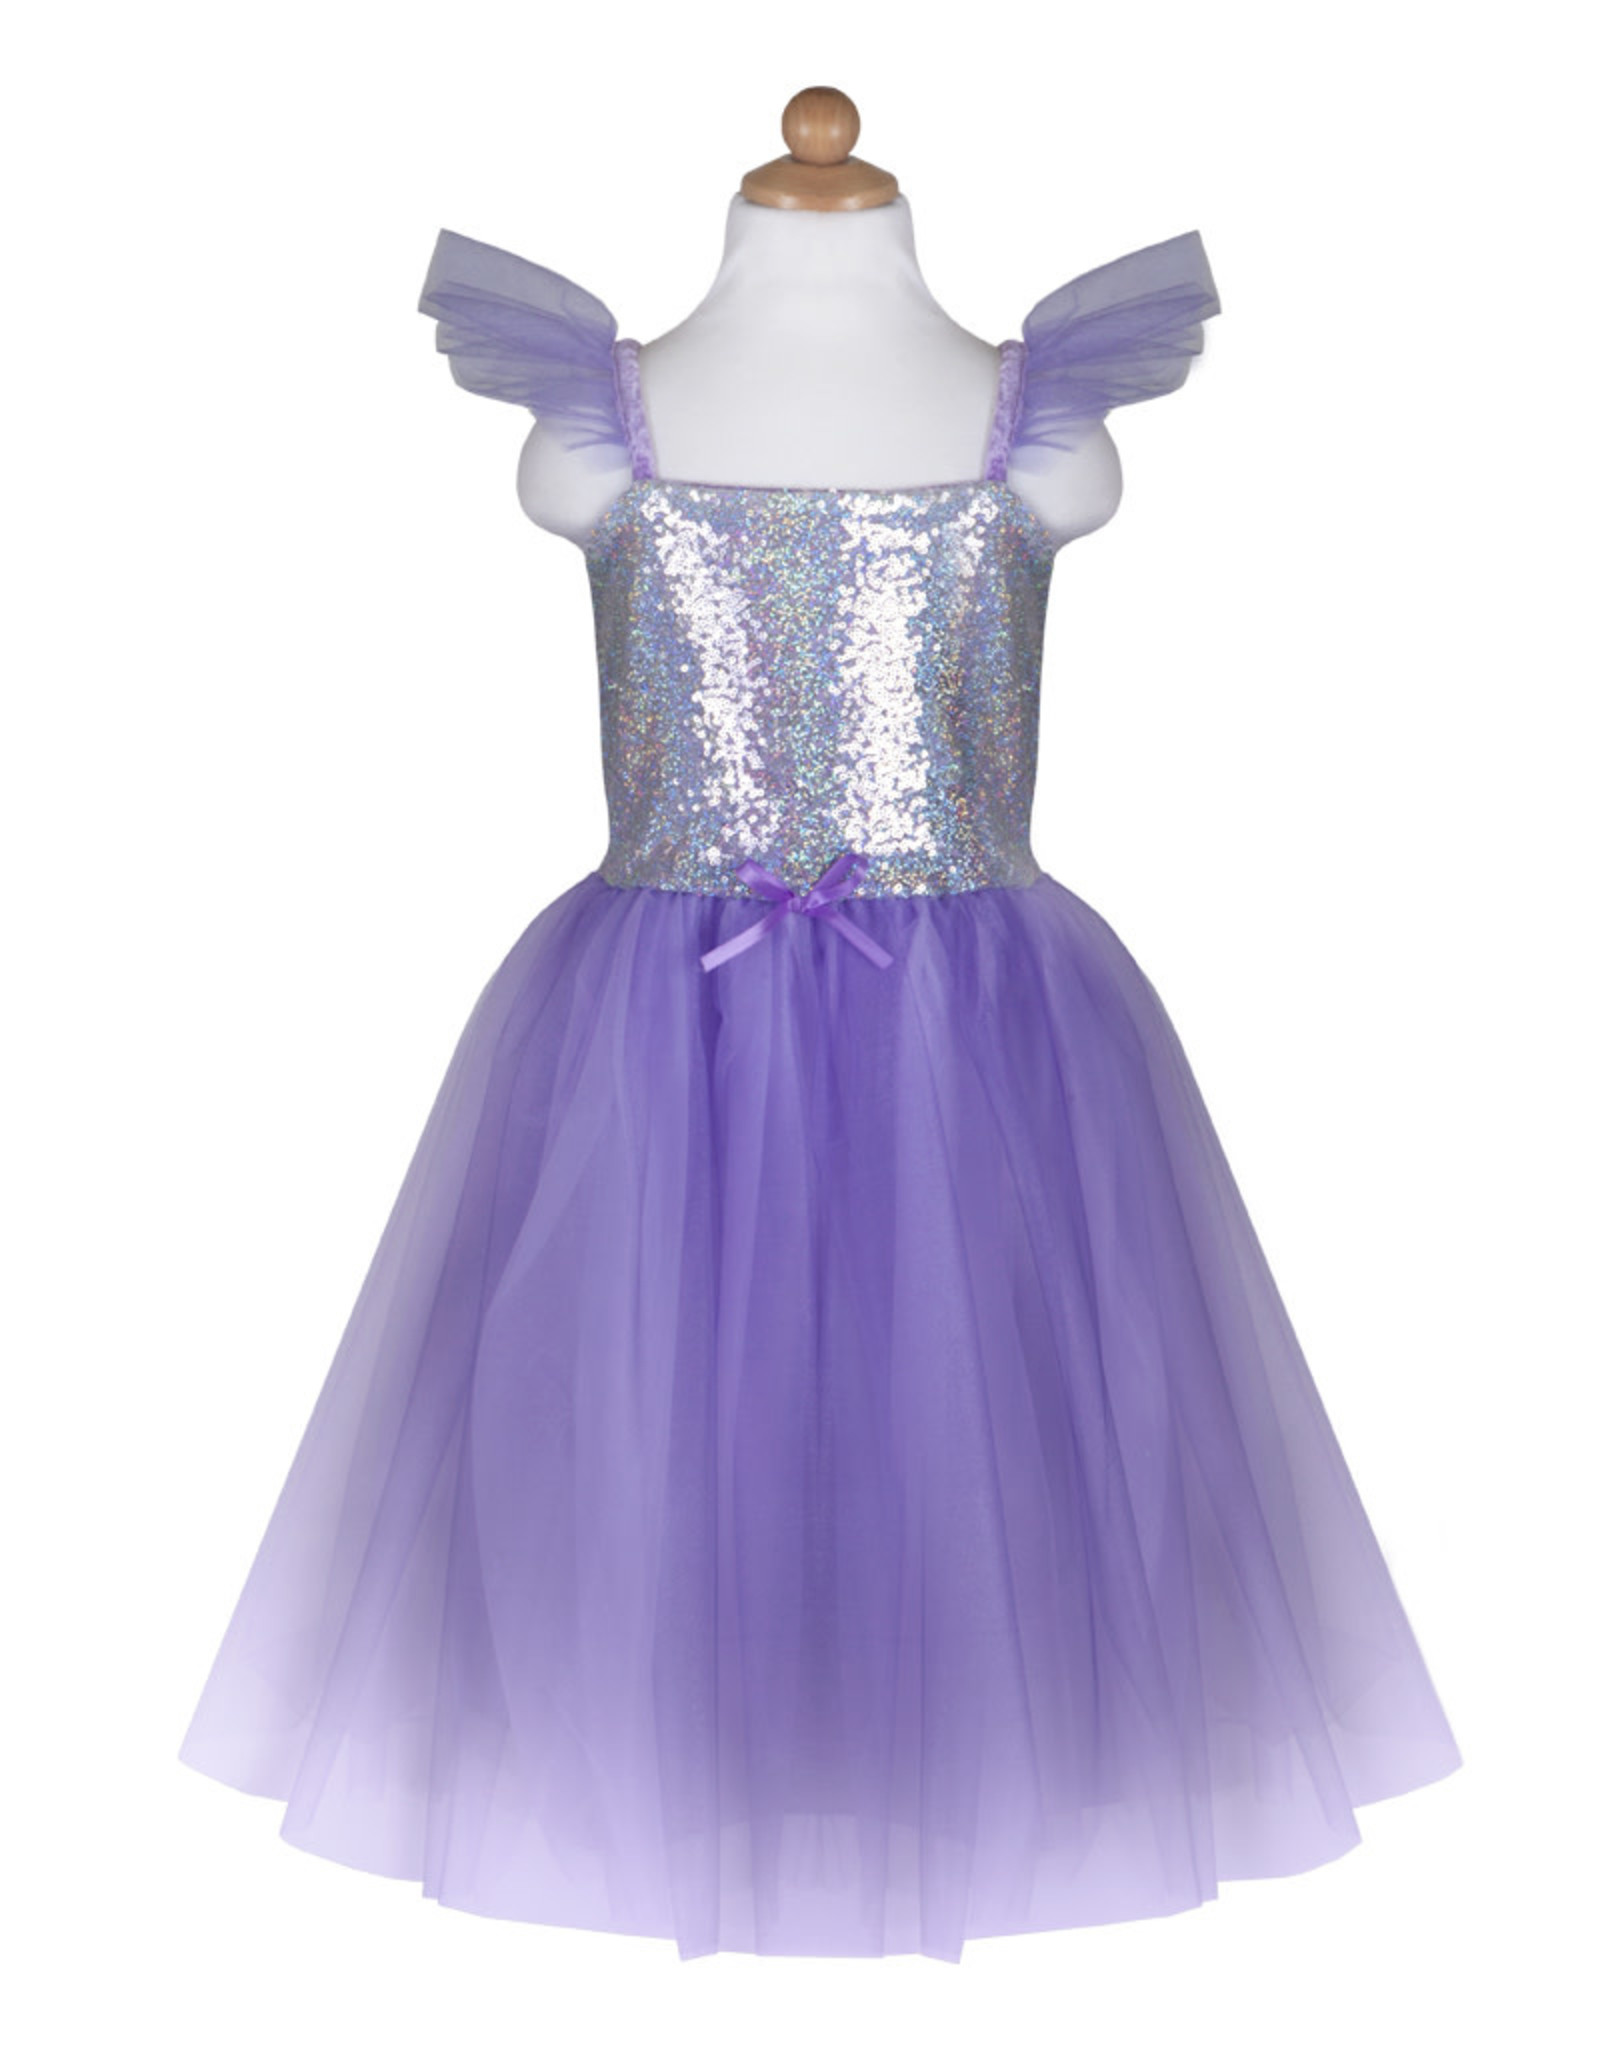 Great Pretenders Sequins Princess Dress - Lilac - Size 3-4